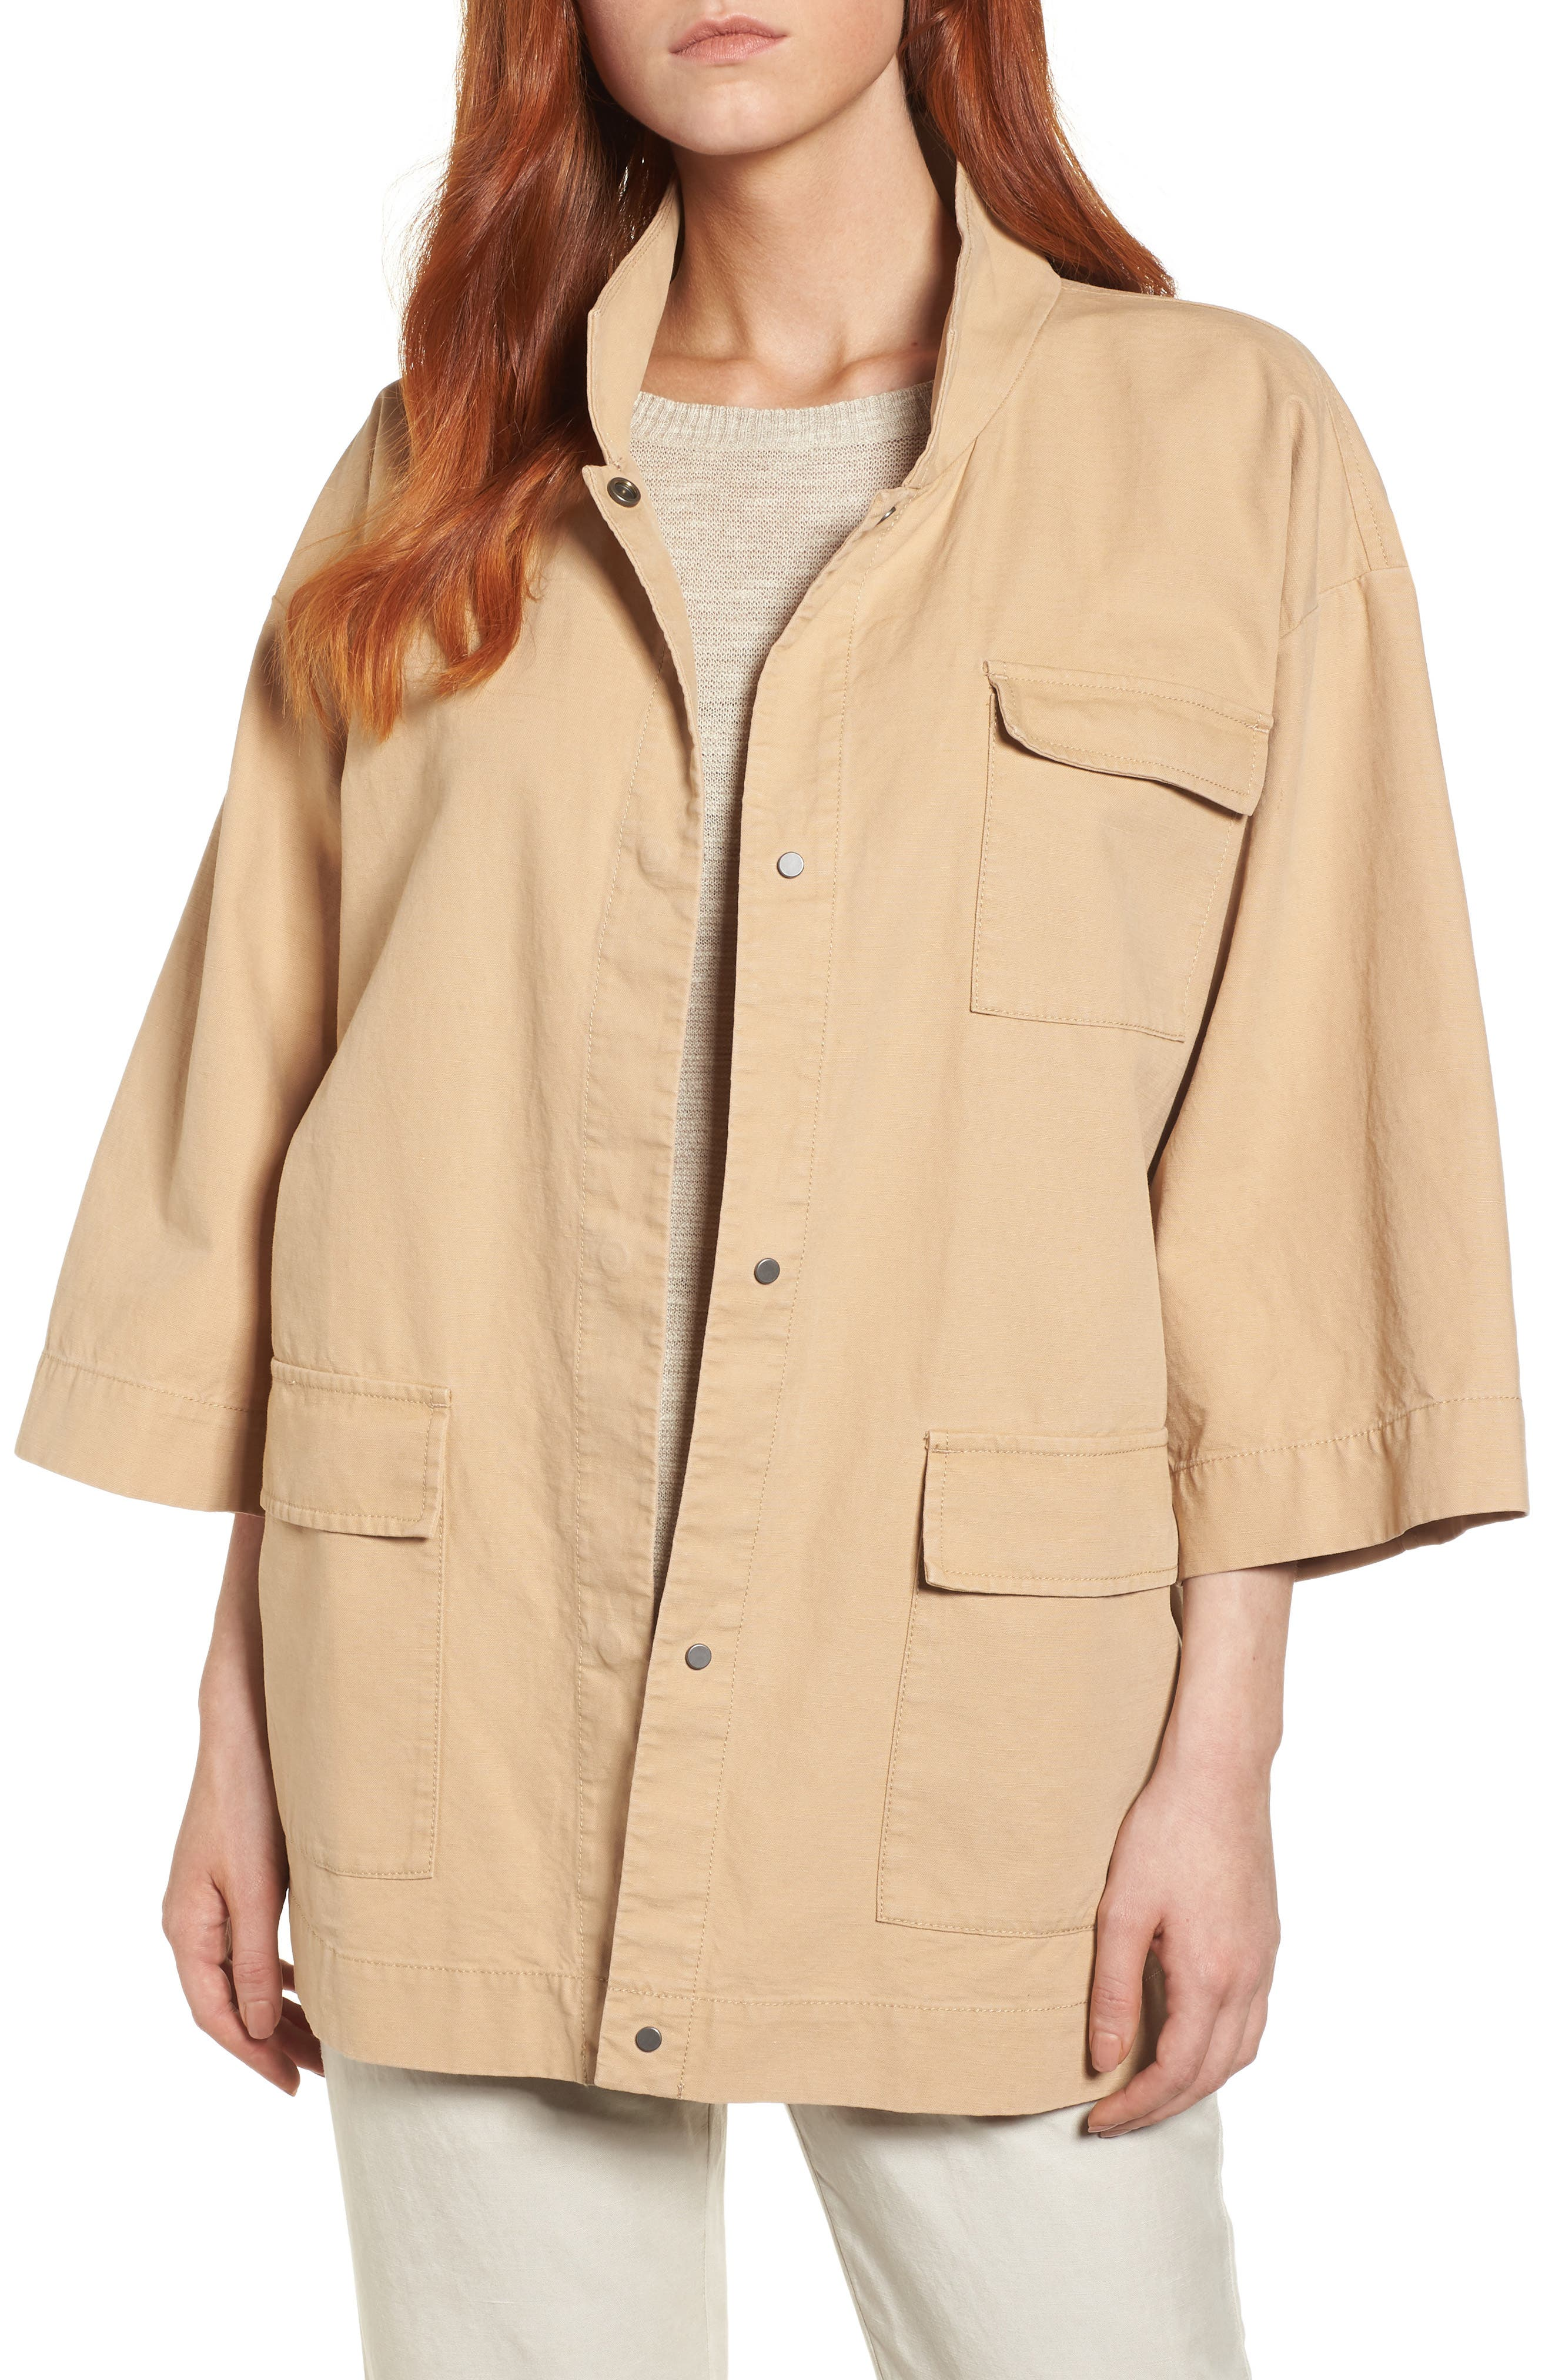 Organic Cotton & Hemp Jacket,                             Main thumbnail 1, color,                             Wheat